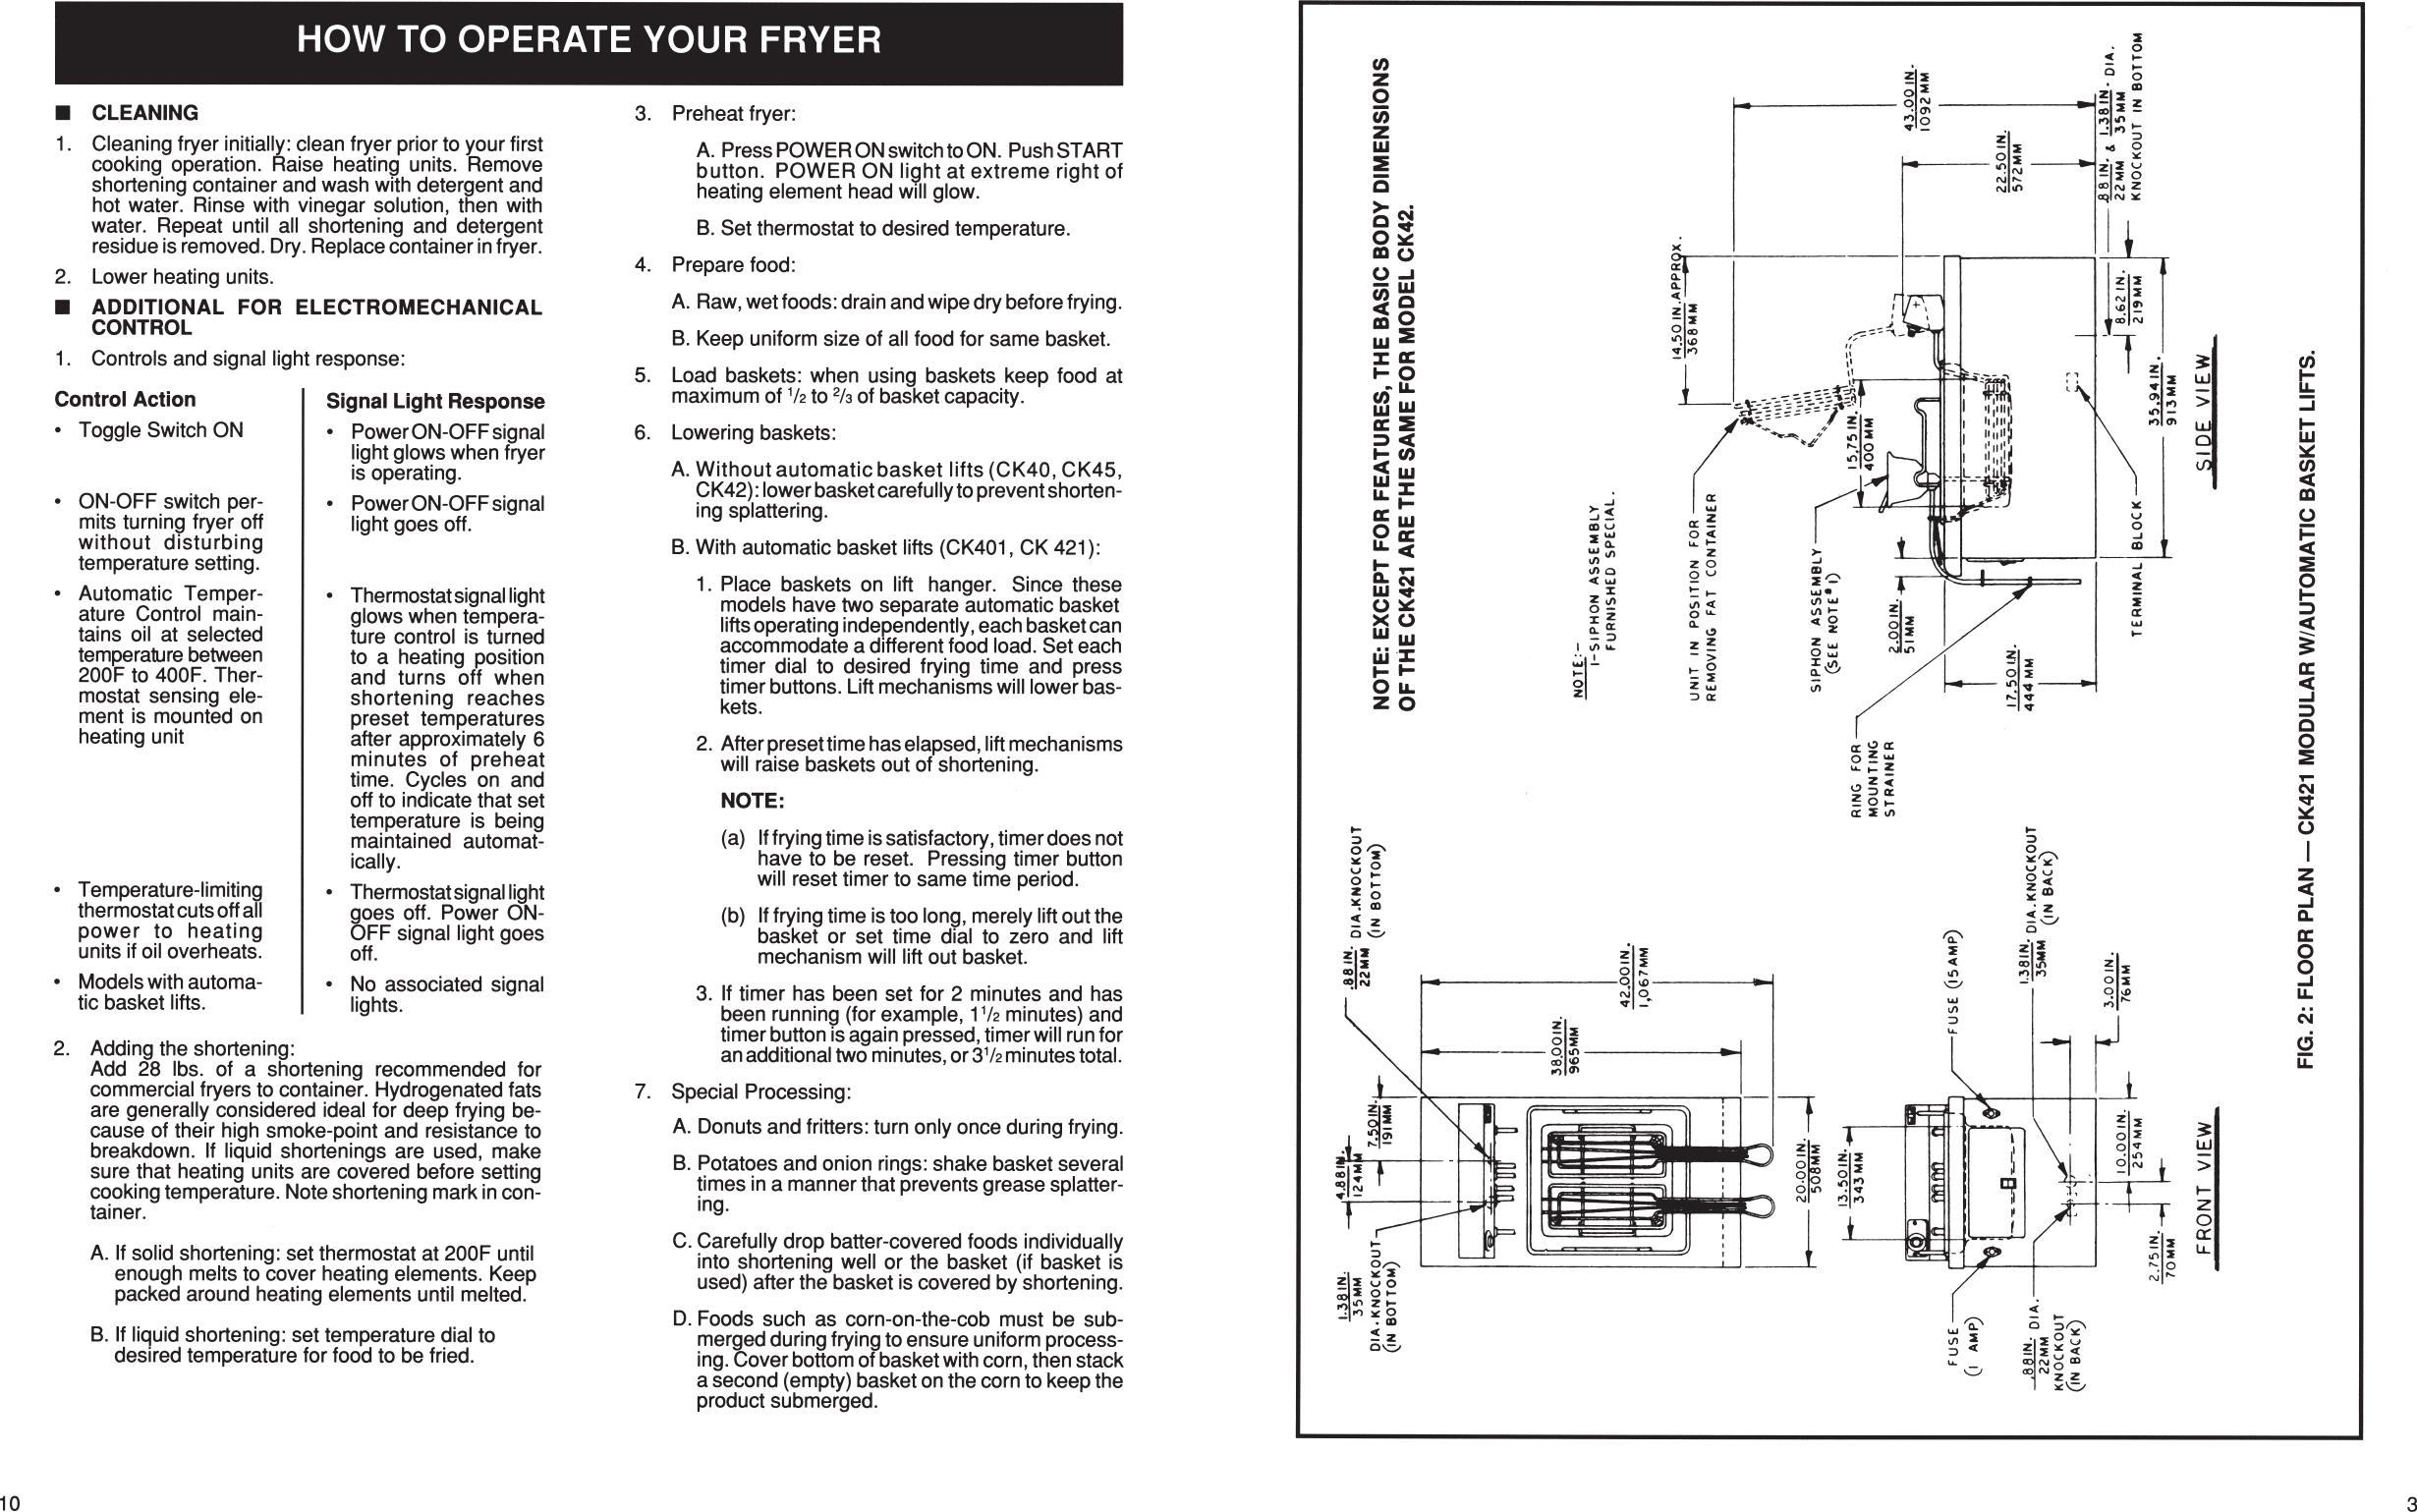 Fabulous Wrg 7488 Verucci Wiring Diagram Wiring Digital Resources Dylitashwinbiharinl